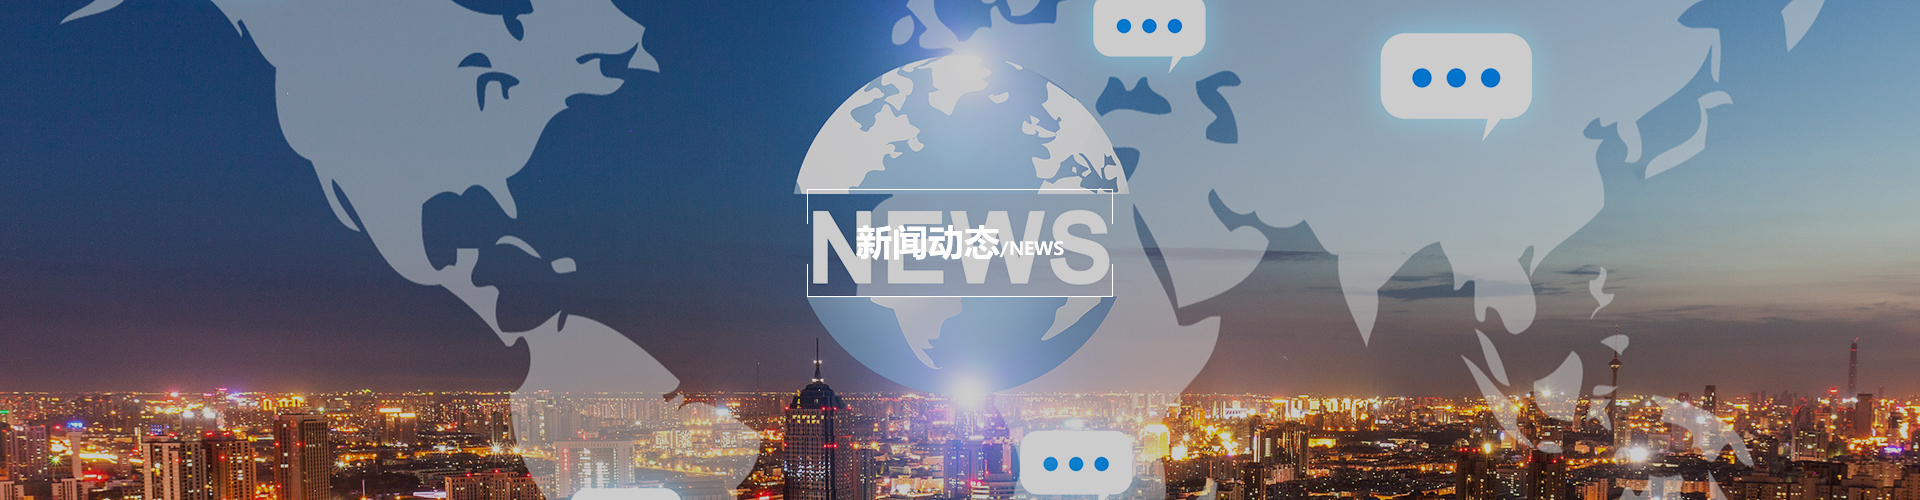 http://www.sxjinlongjixie.com/data/upload/202103/20210304180814_396.jpg